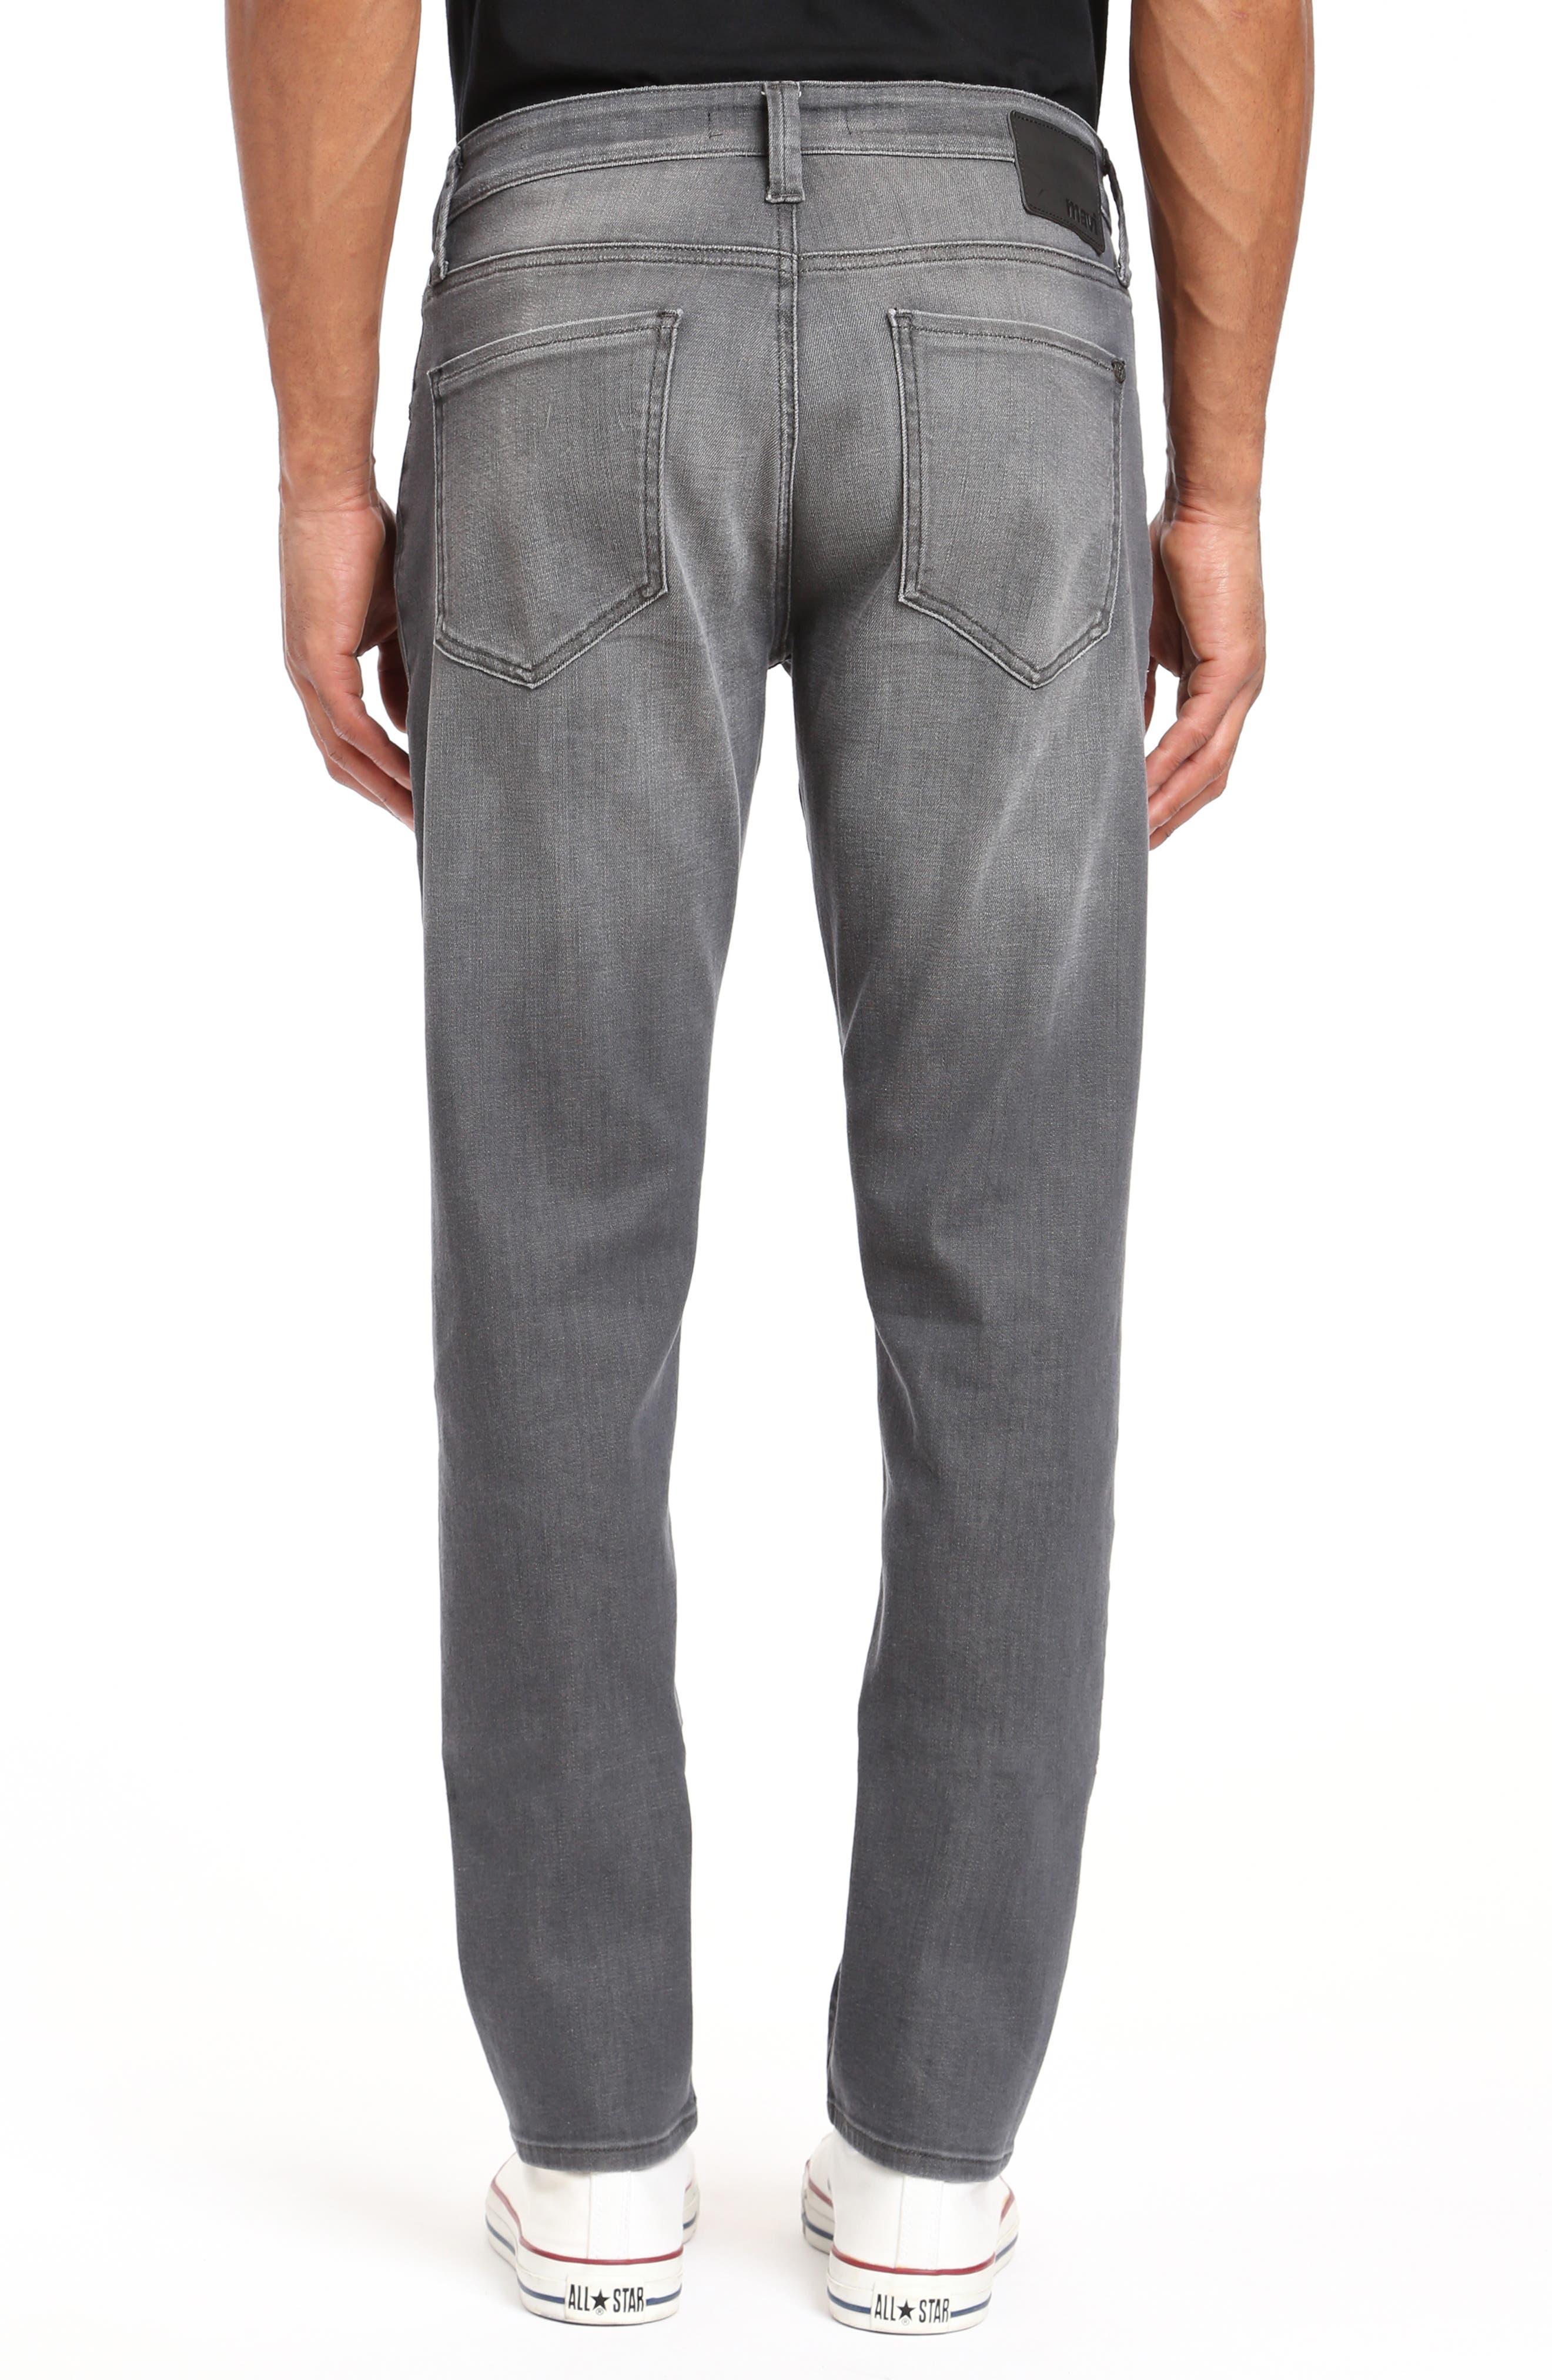 Zach Straight Leg Jeans,                             Alternate thumbnail 2, color,                             LIGHT GREY BROOKLYN